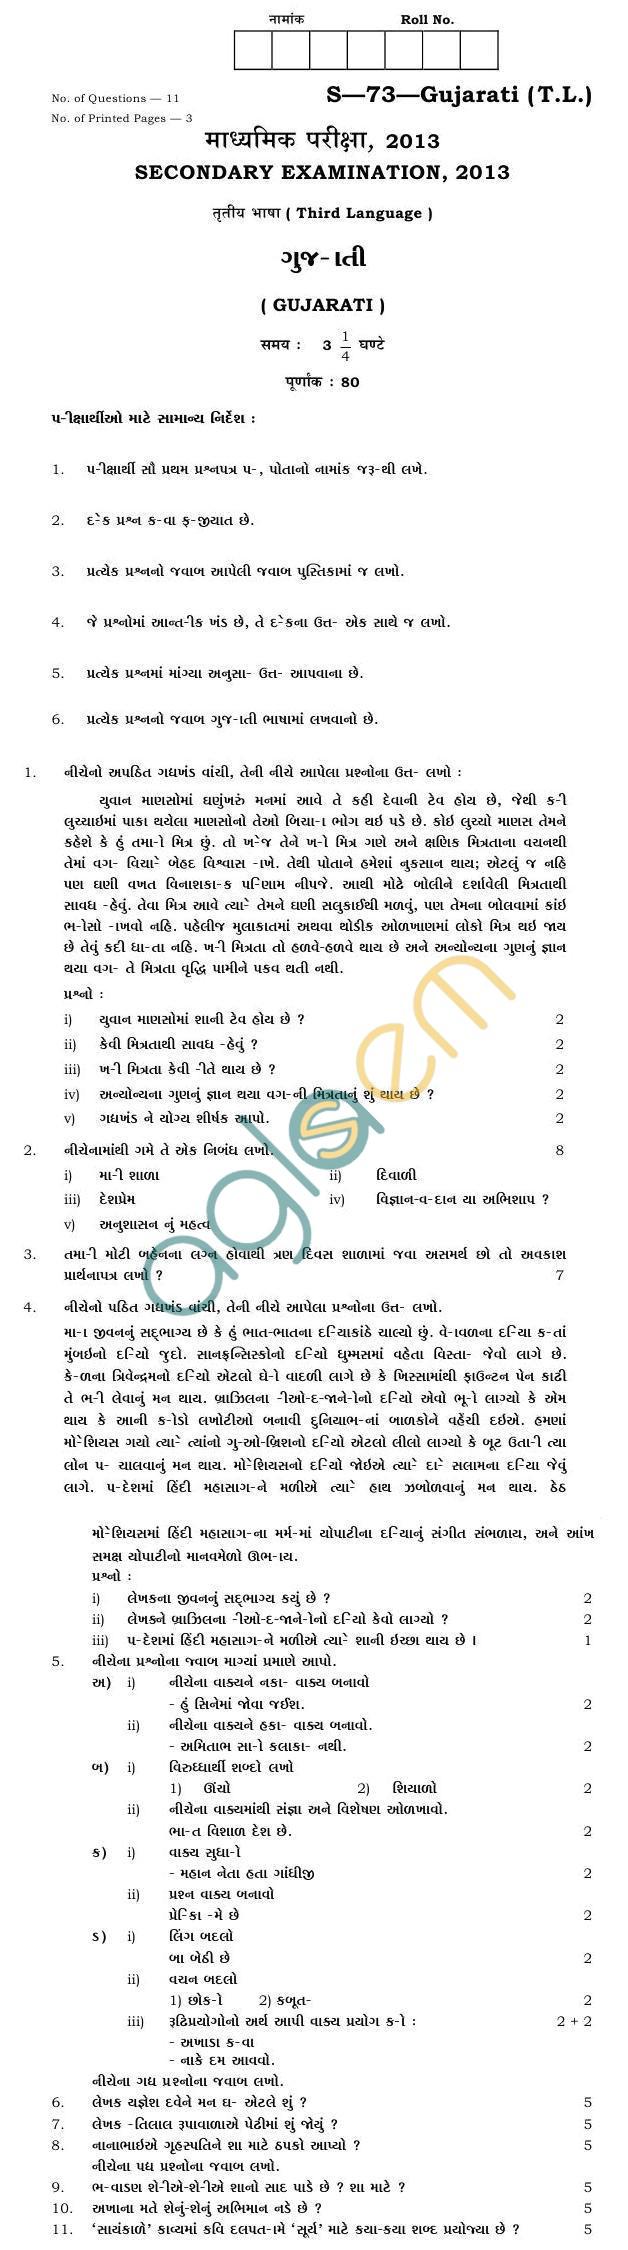 Rajasthan Board Secondary Gujrati (TL) Question Paper 2013